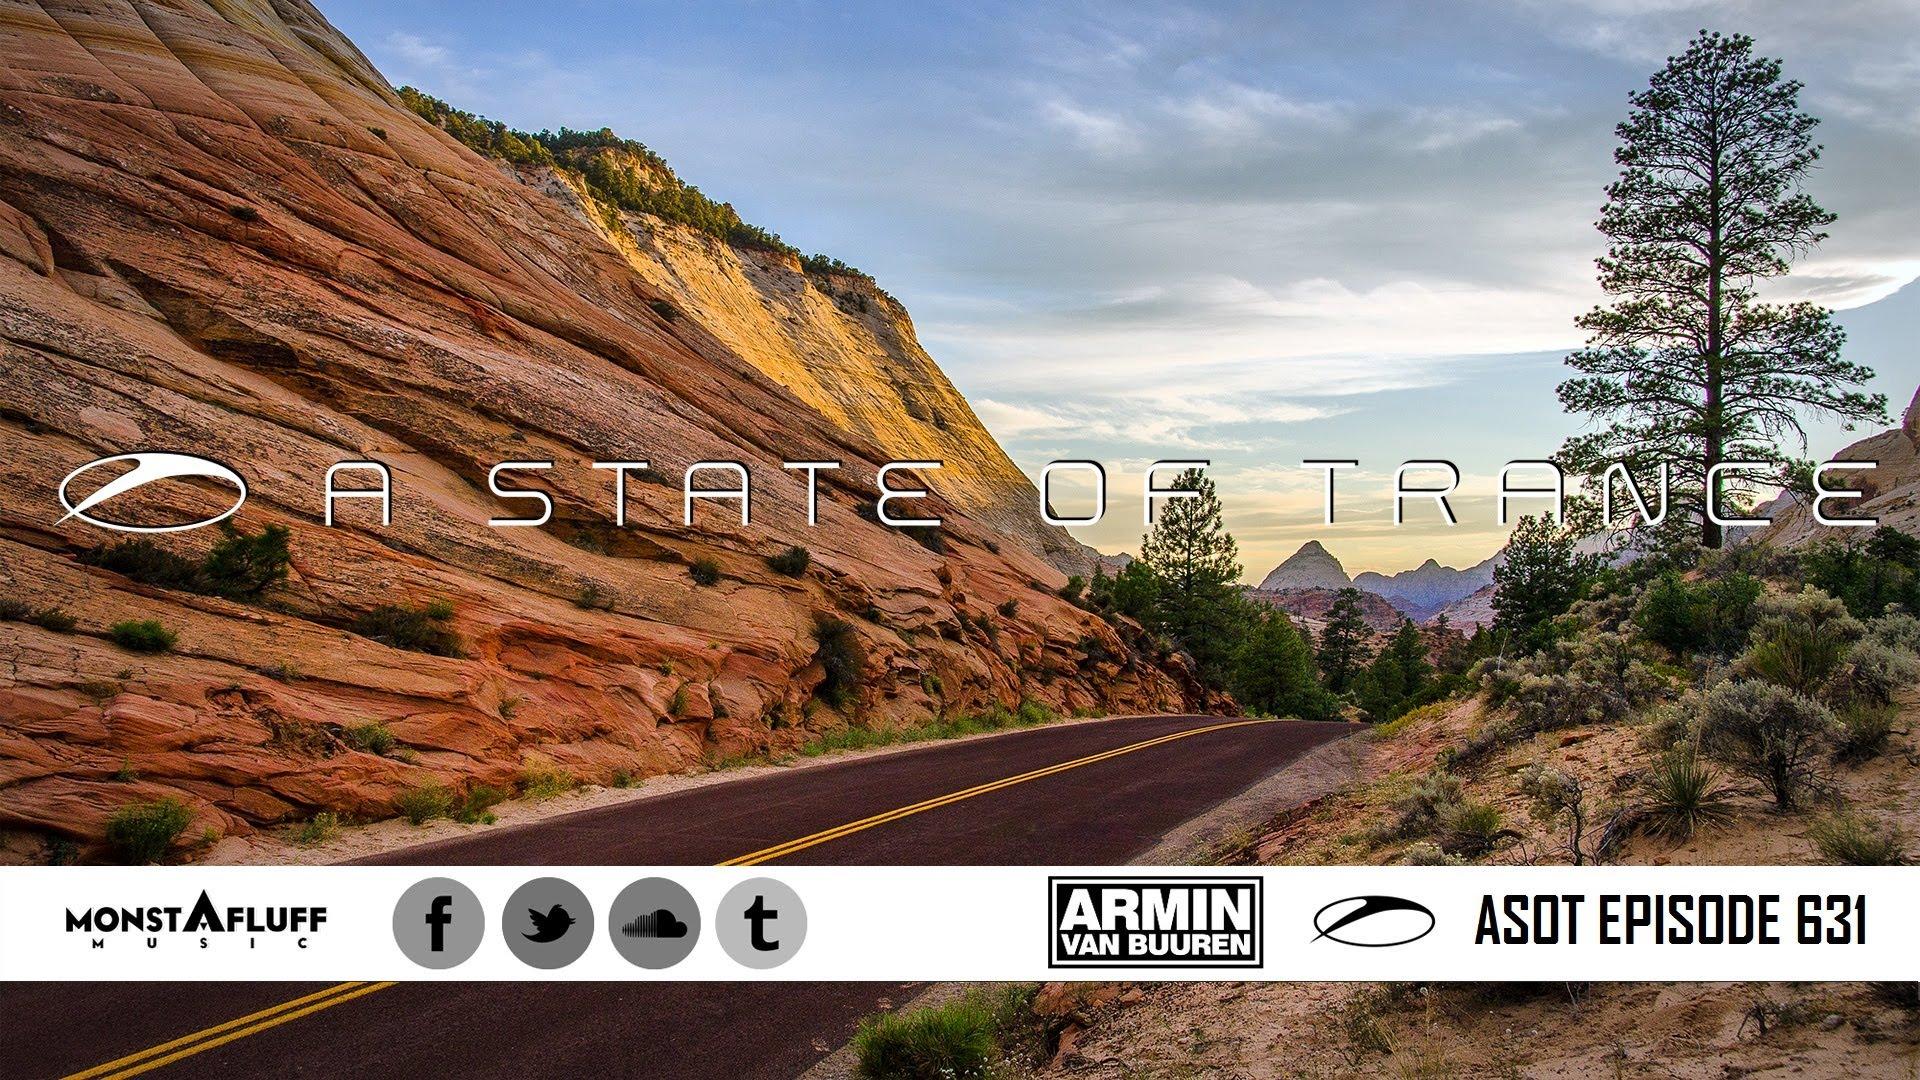 Armin van Buuren – A State of Trance 631